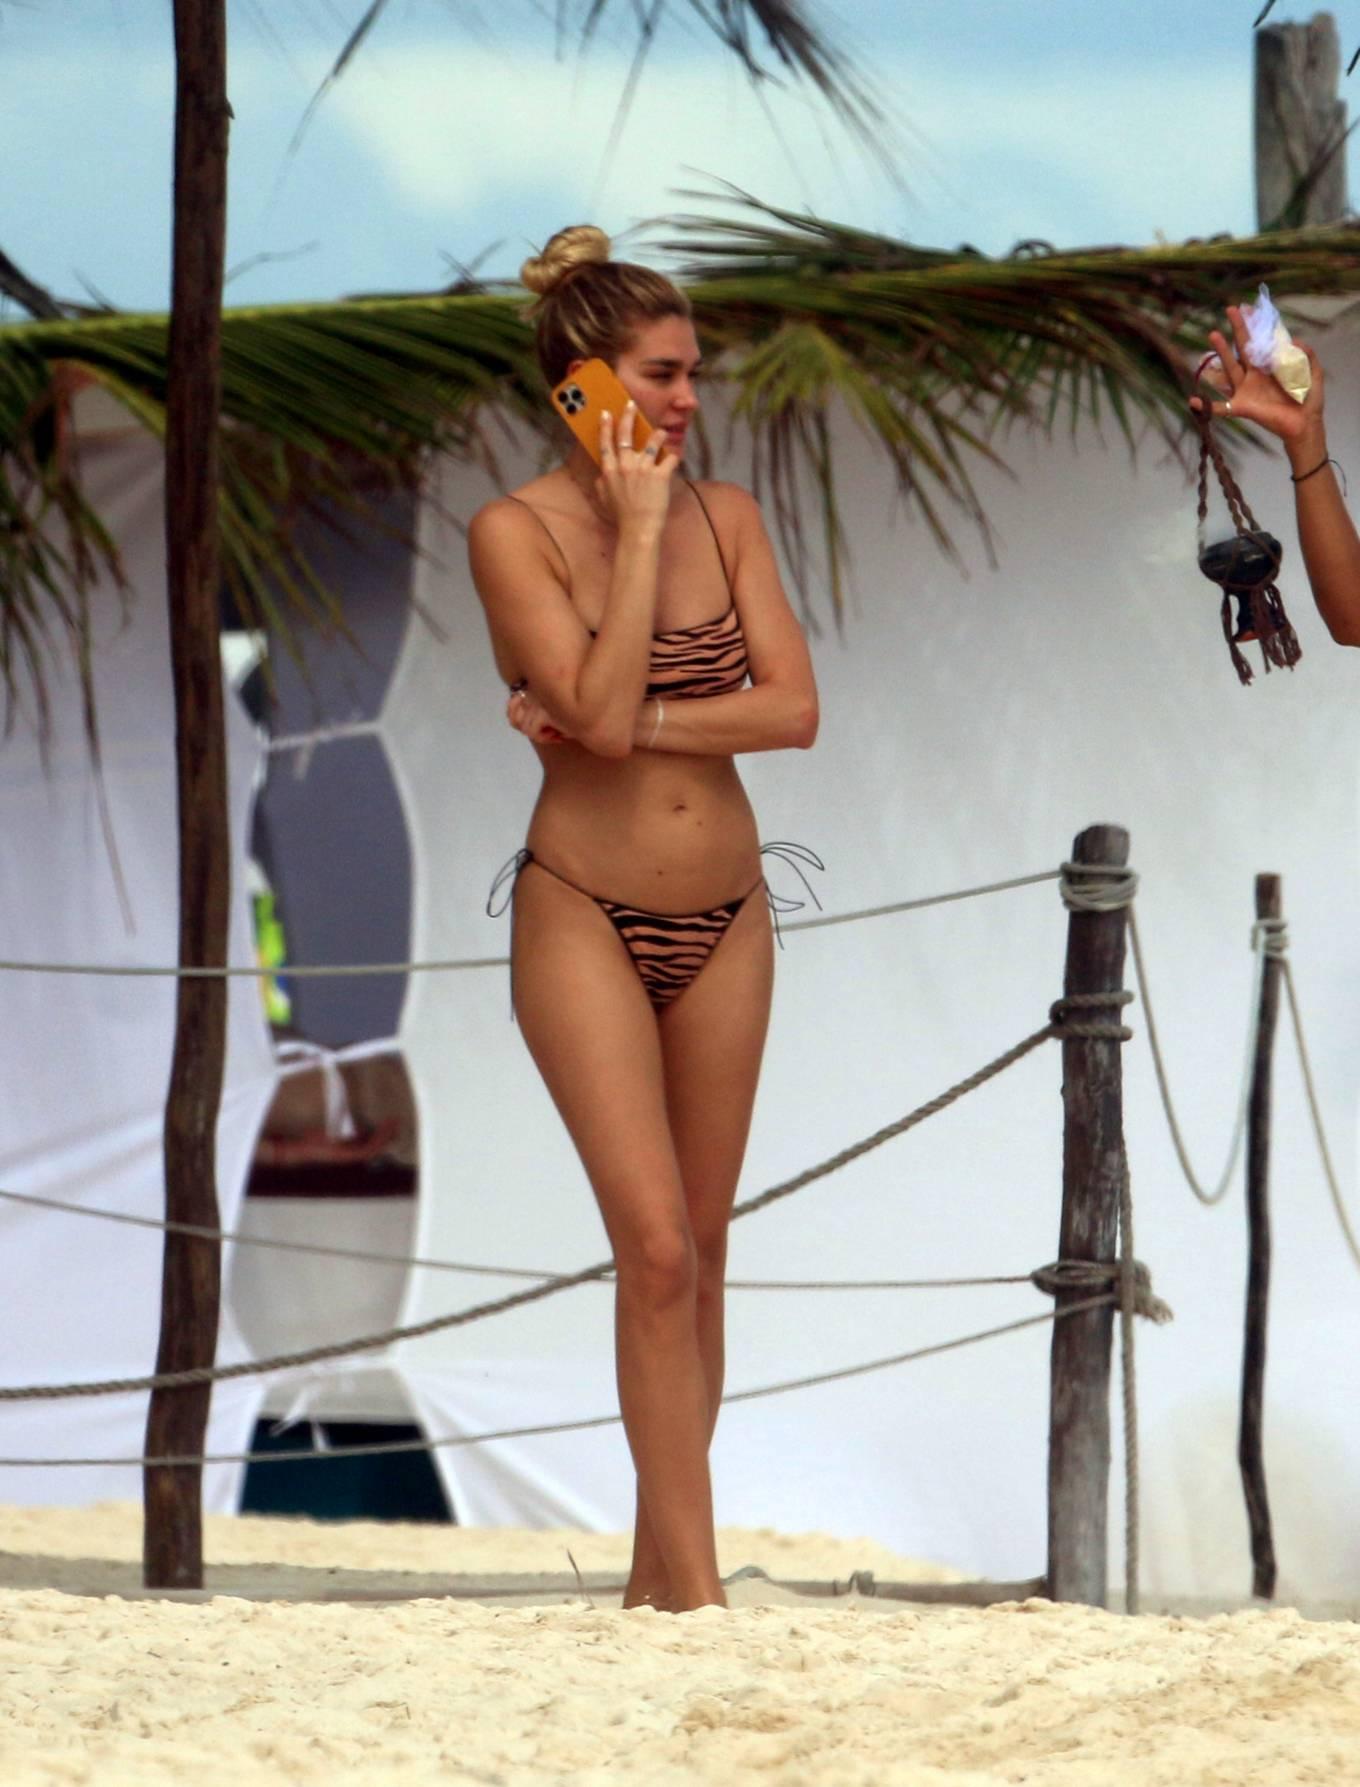 Shayna Taylor - In a tiger print bikini at a beach in Tulum